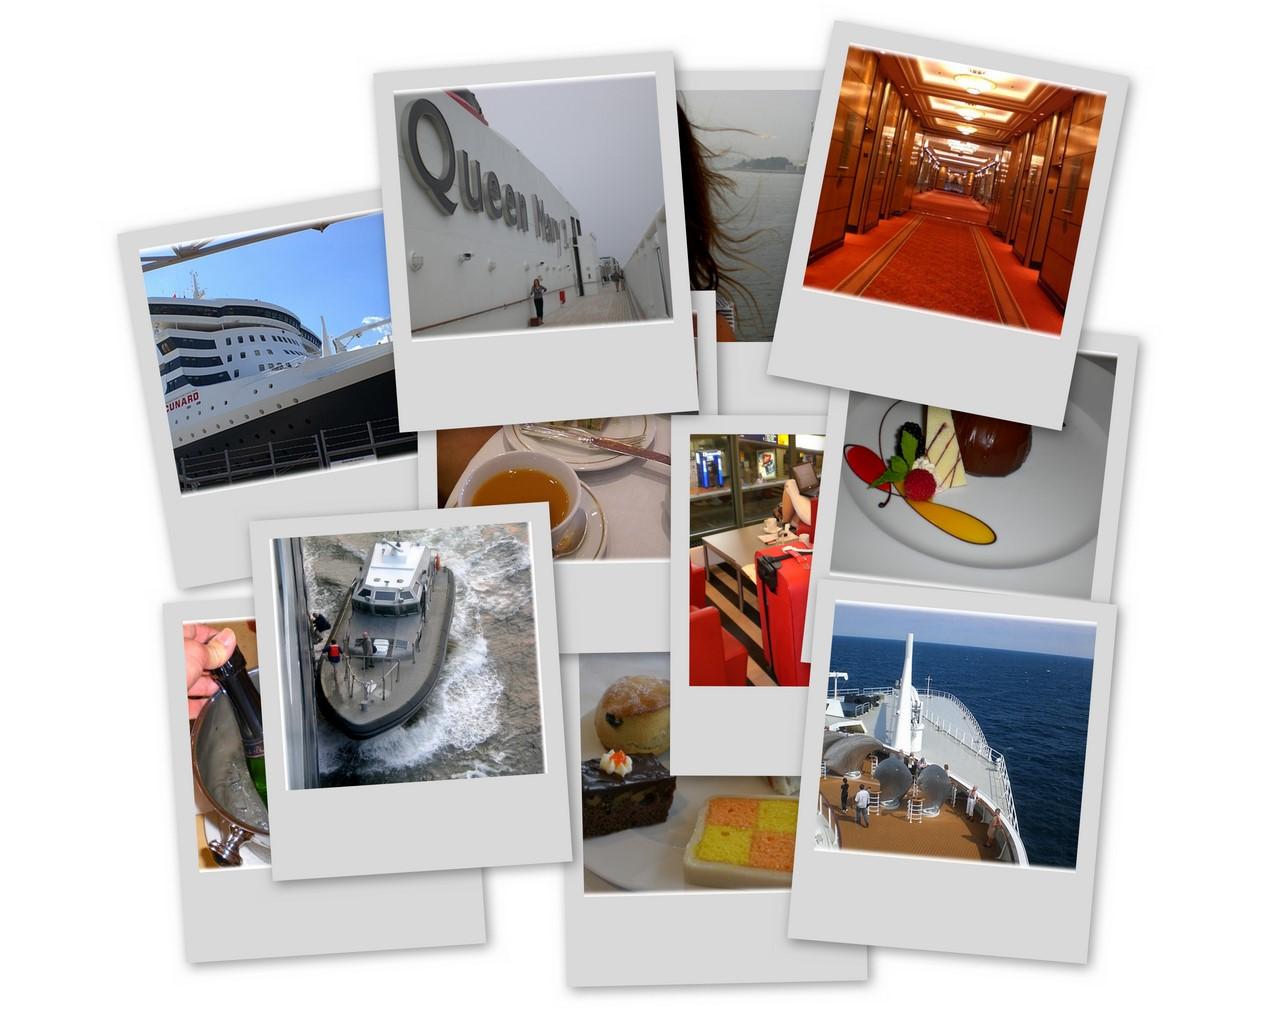 qm2-collage-big3l.jpg